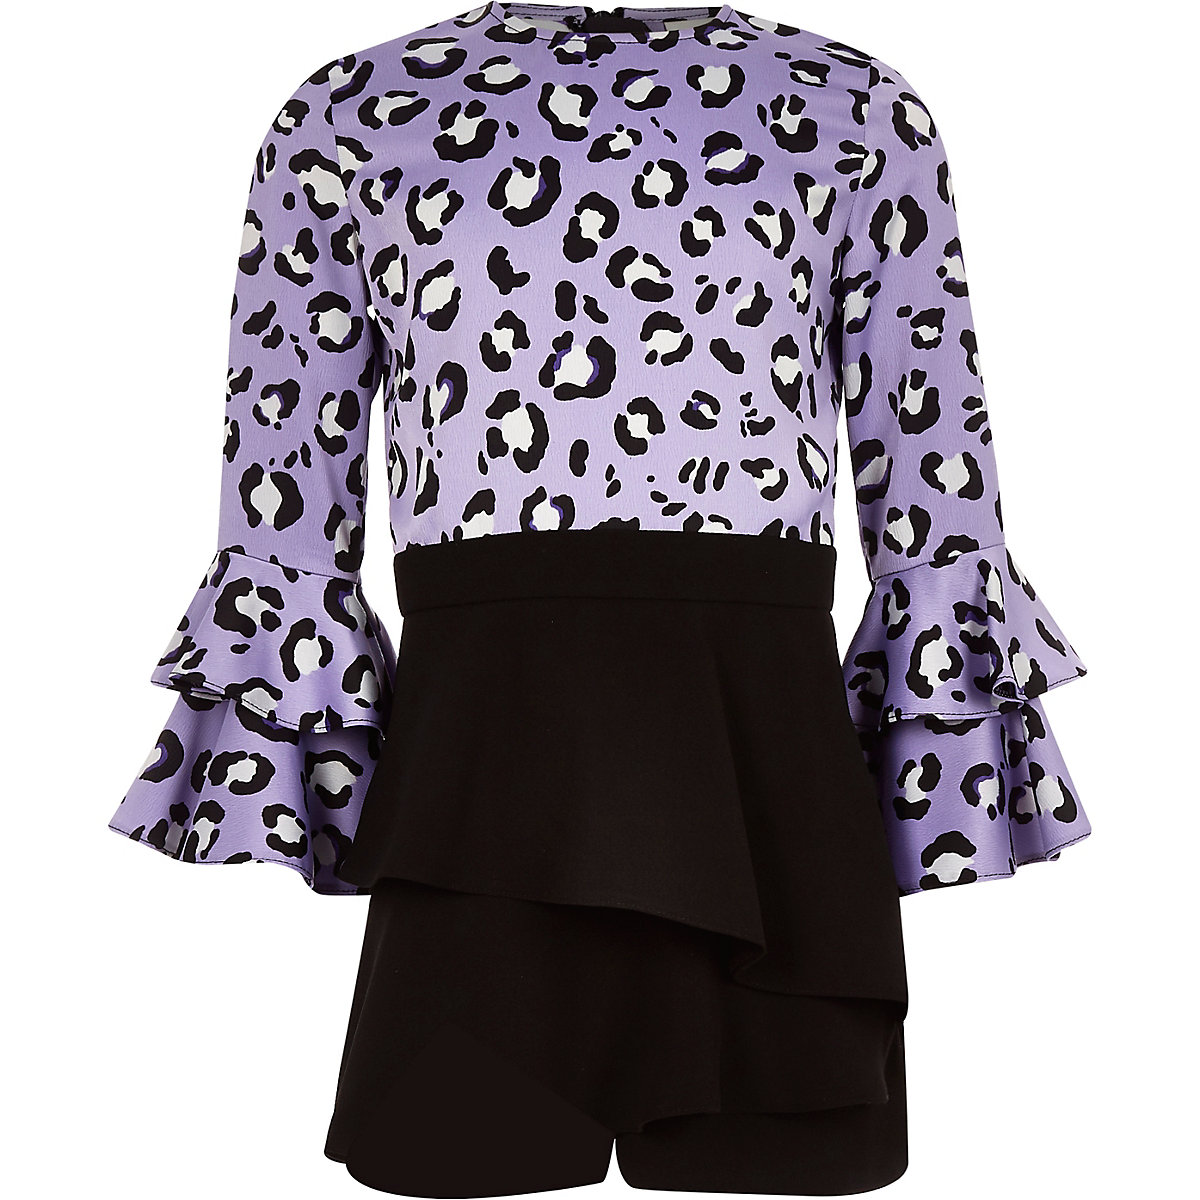 Girls purple leopard print skort playsuit